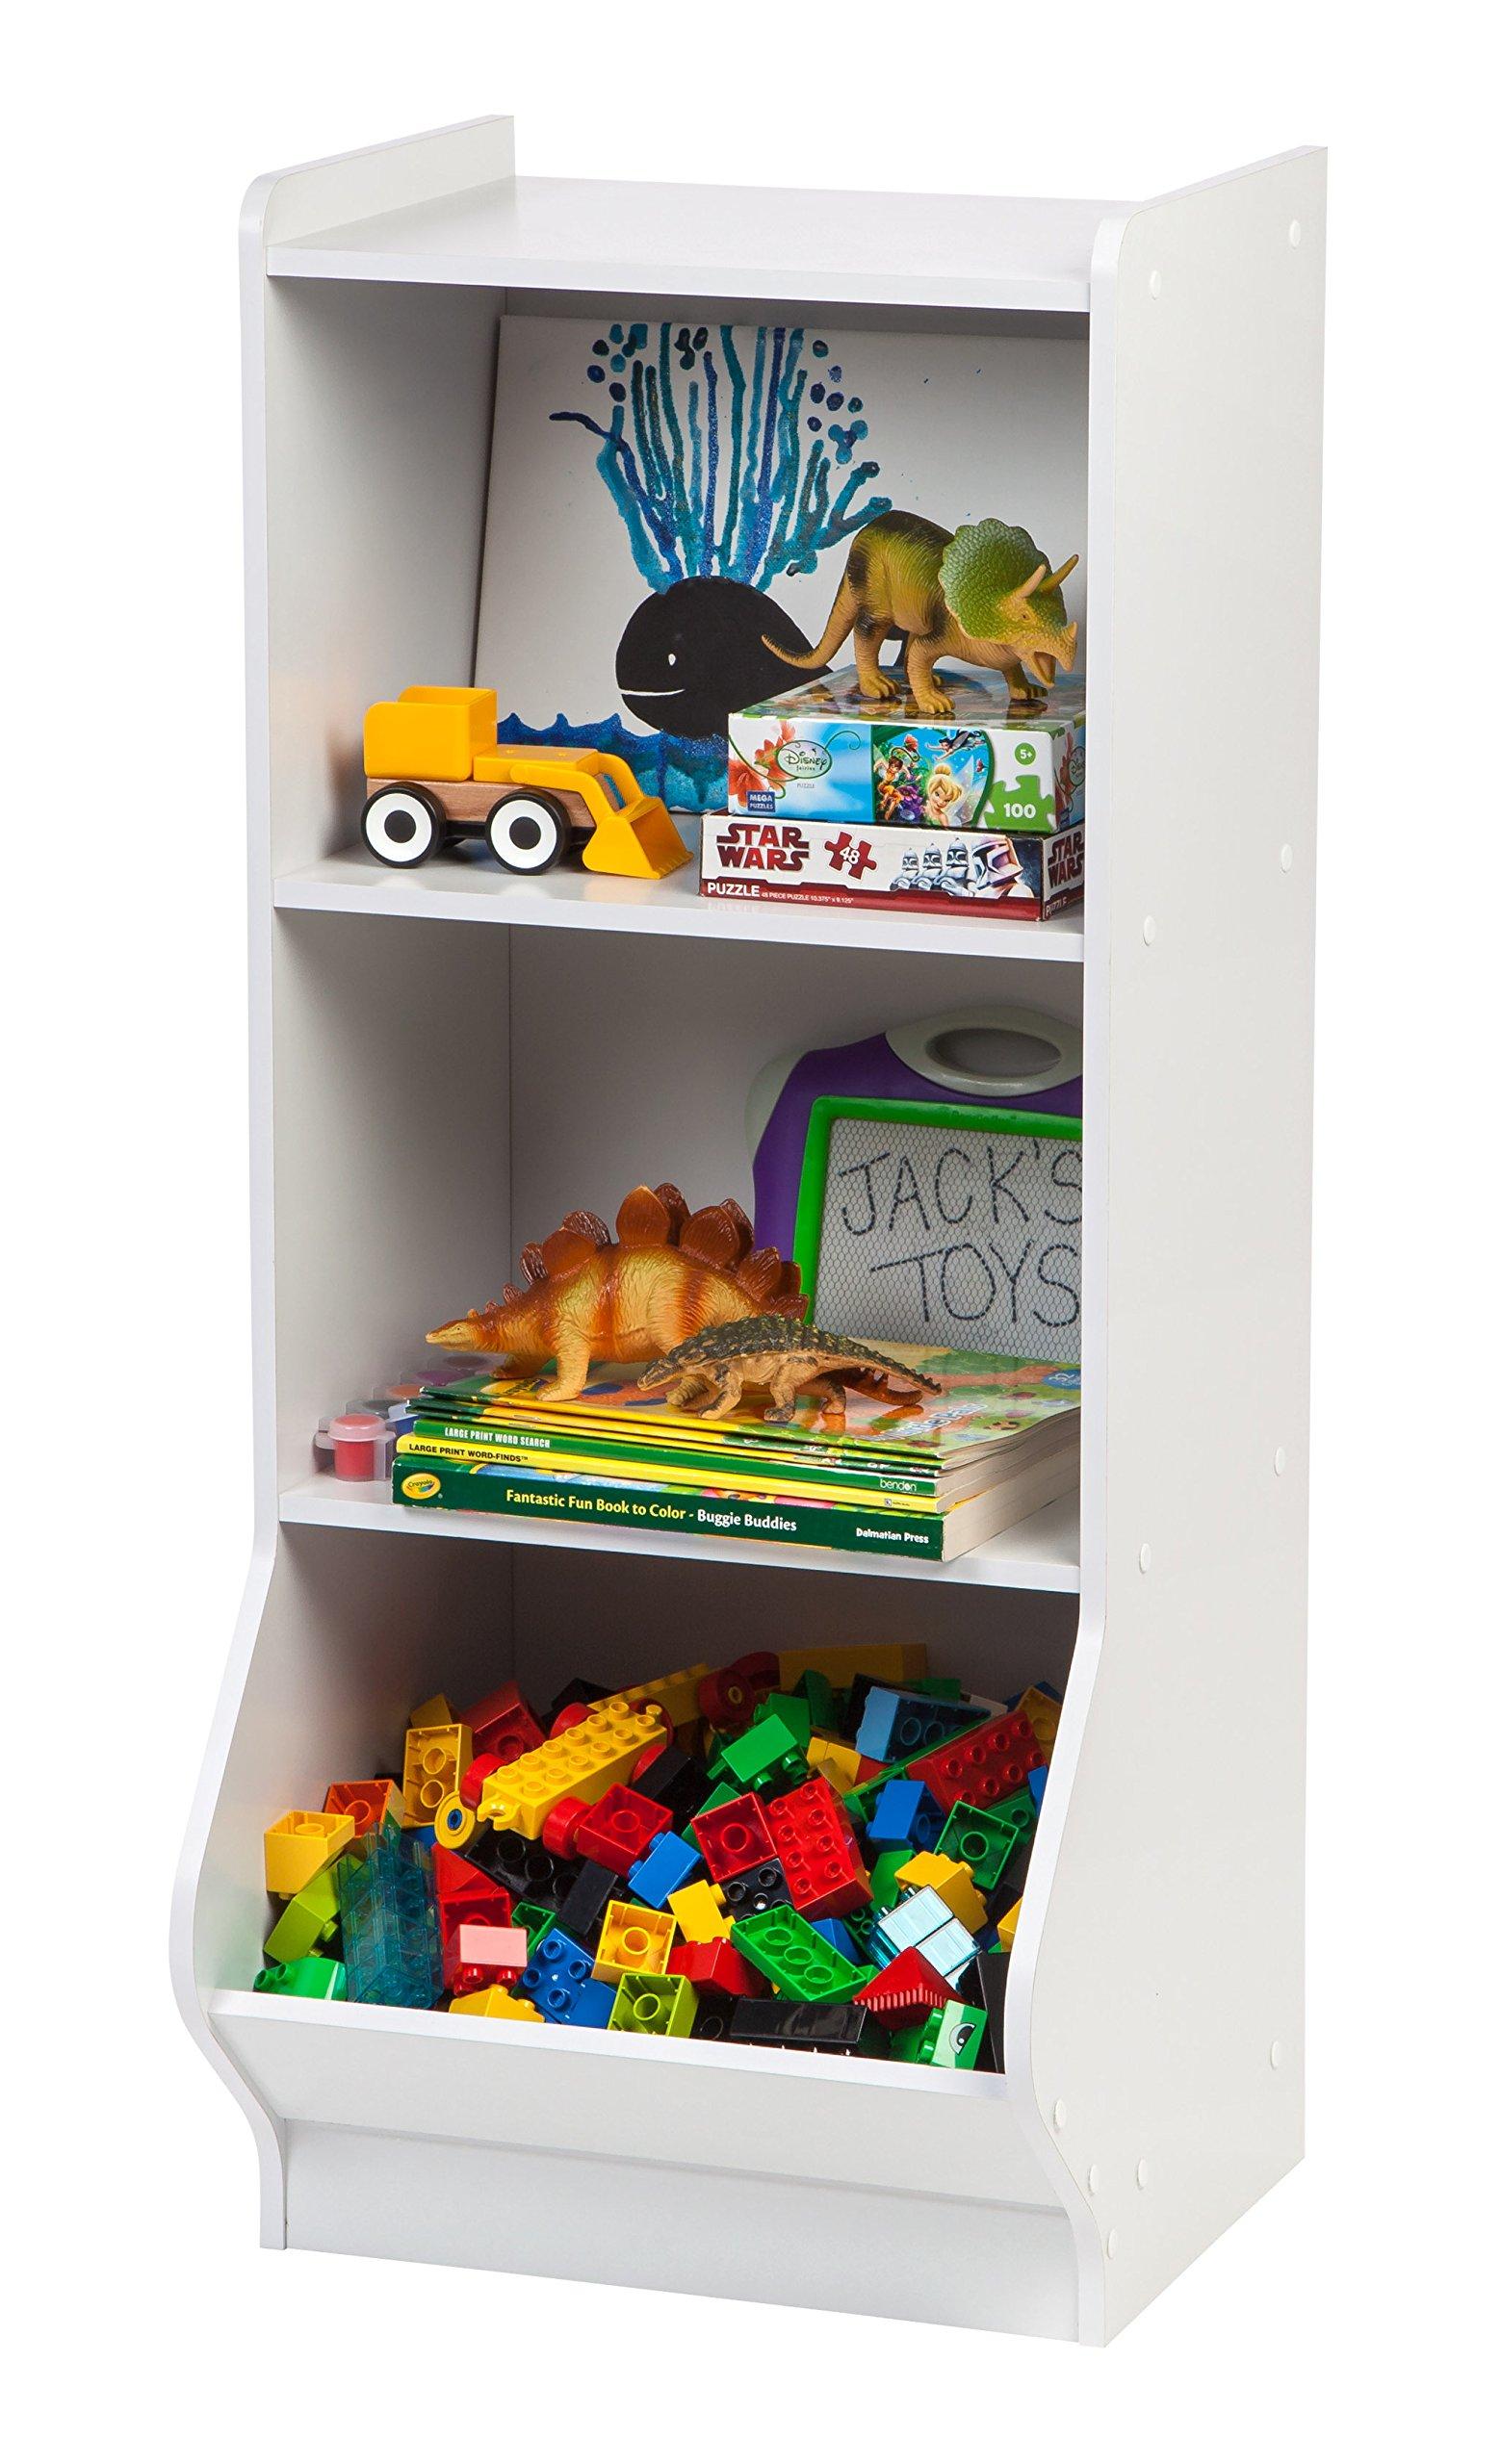 IRIS 3-Tier Storage Organizer Shelf with Footboard, White by IRIS USA, Inc. (Image #2)